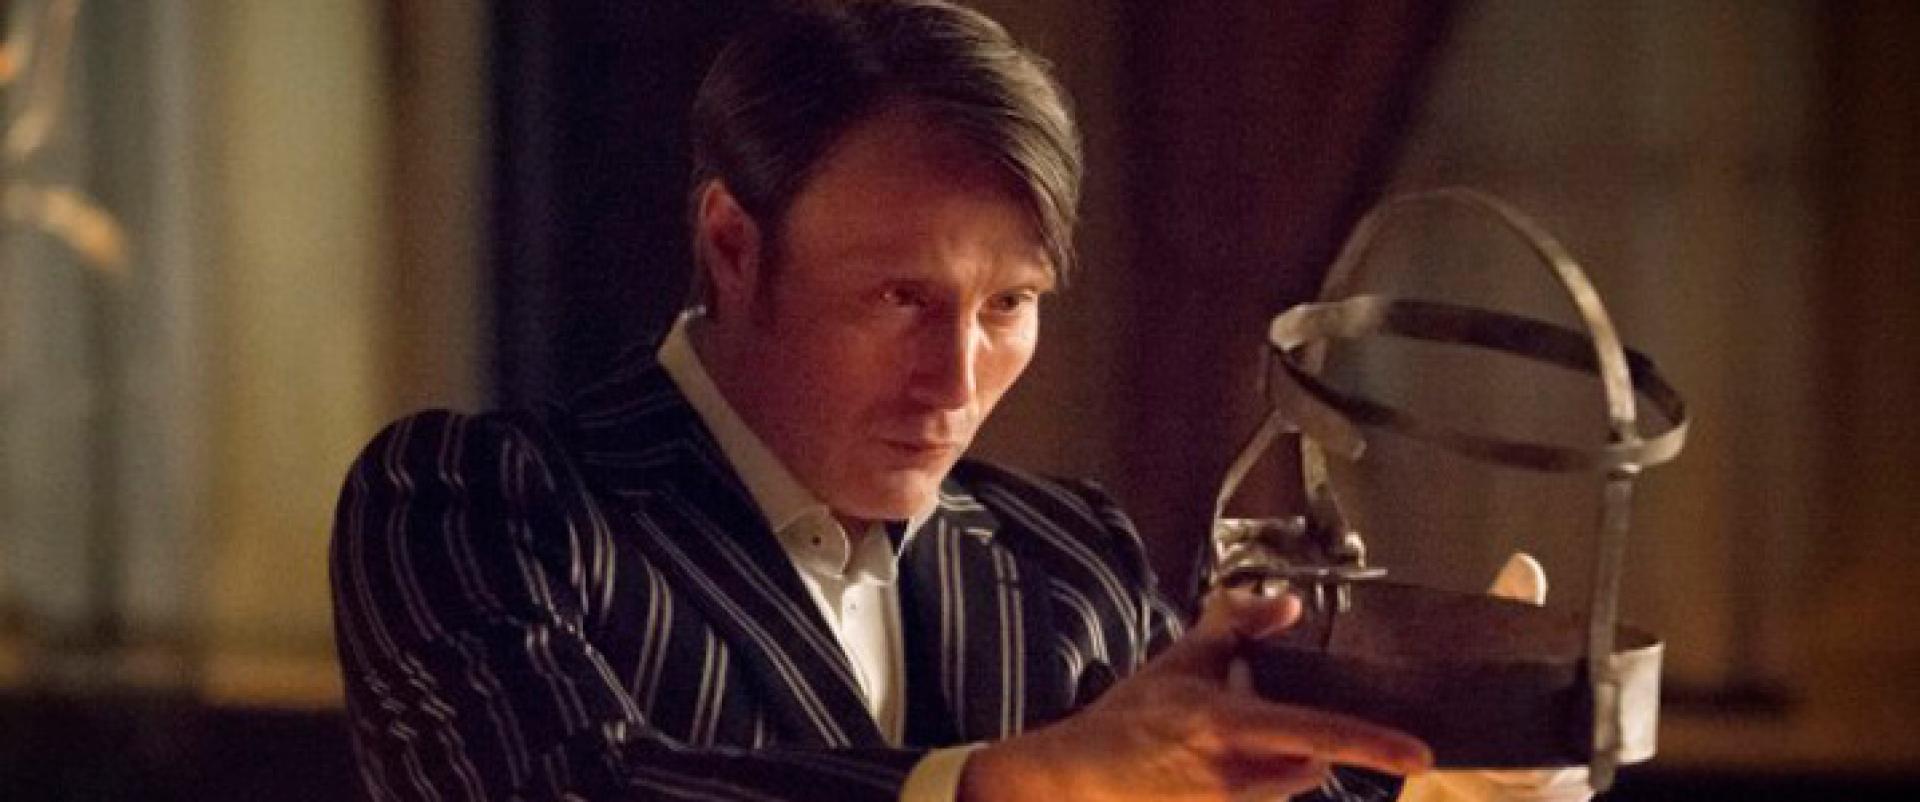 Hannibal: mi lett volna, ha... / mi lenne, ha...